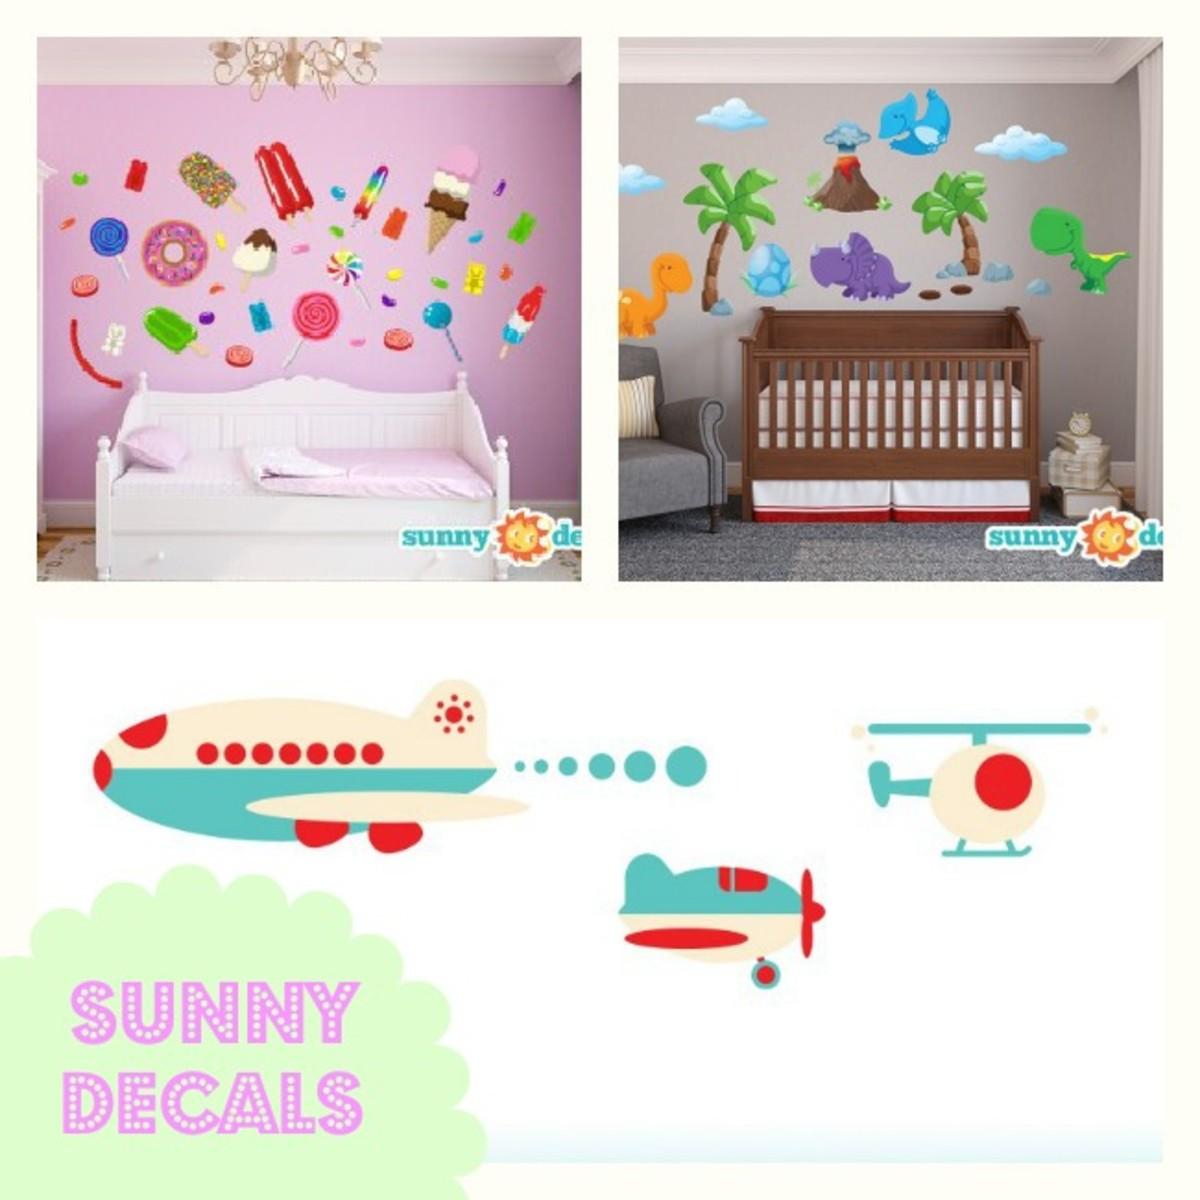 Sunny_Decals